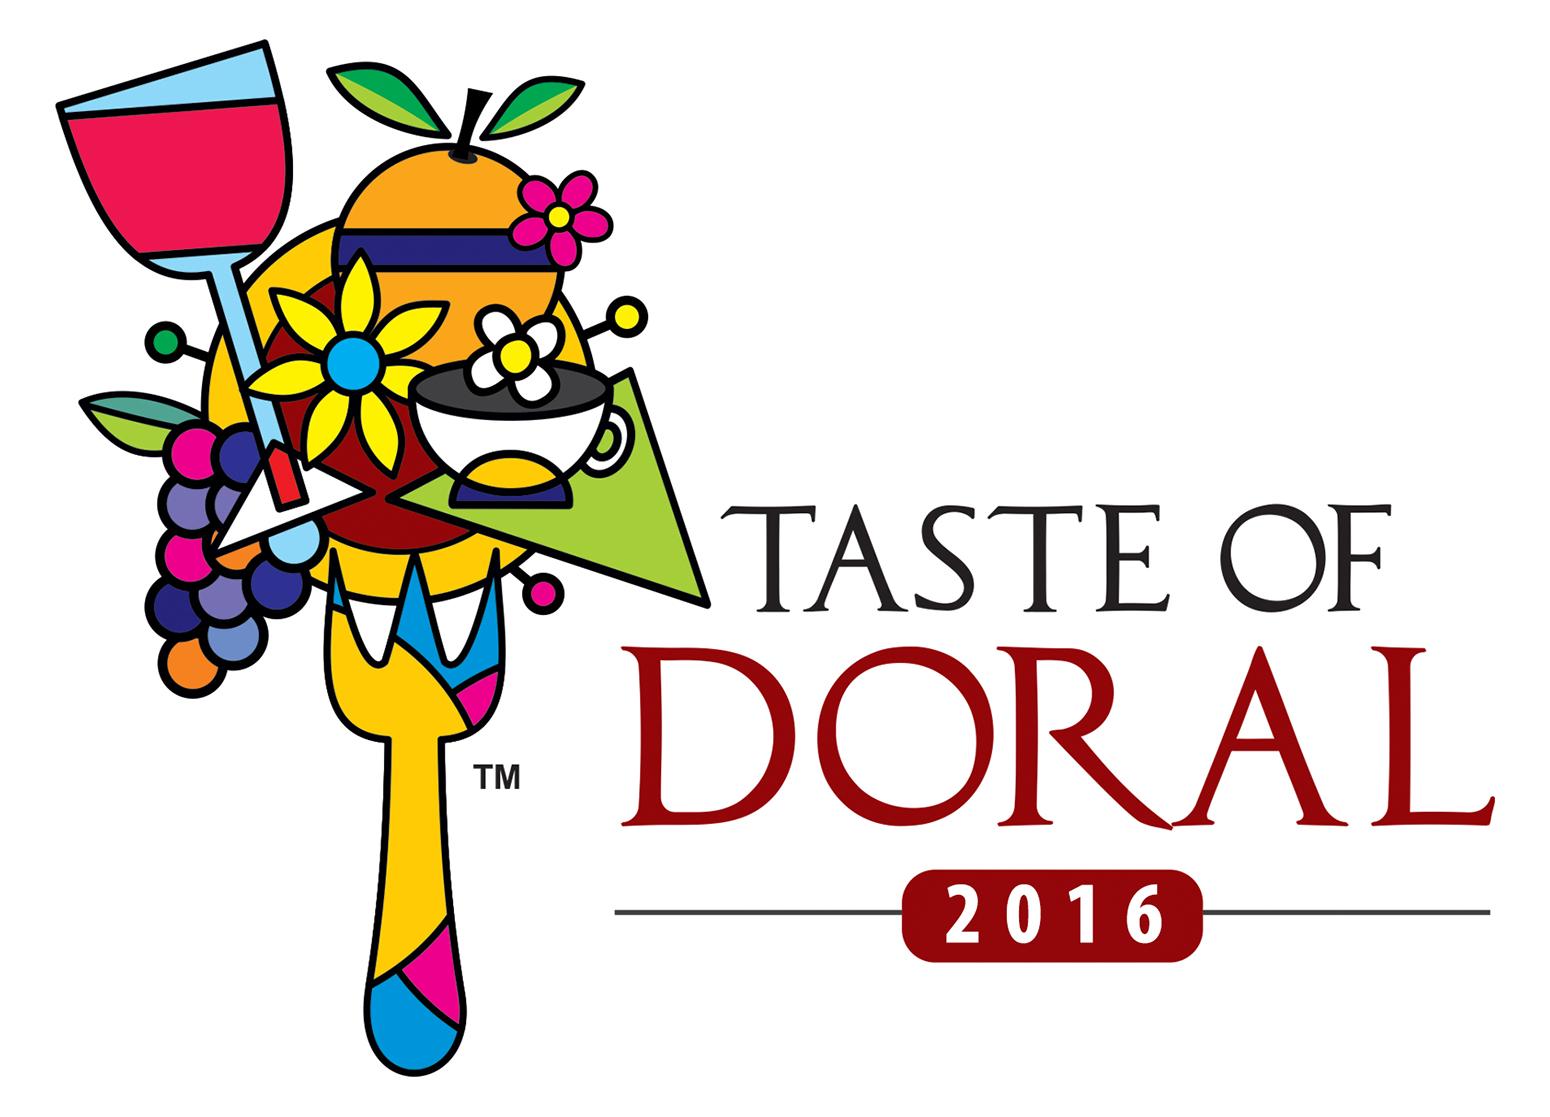 taste-of-doral-2016